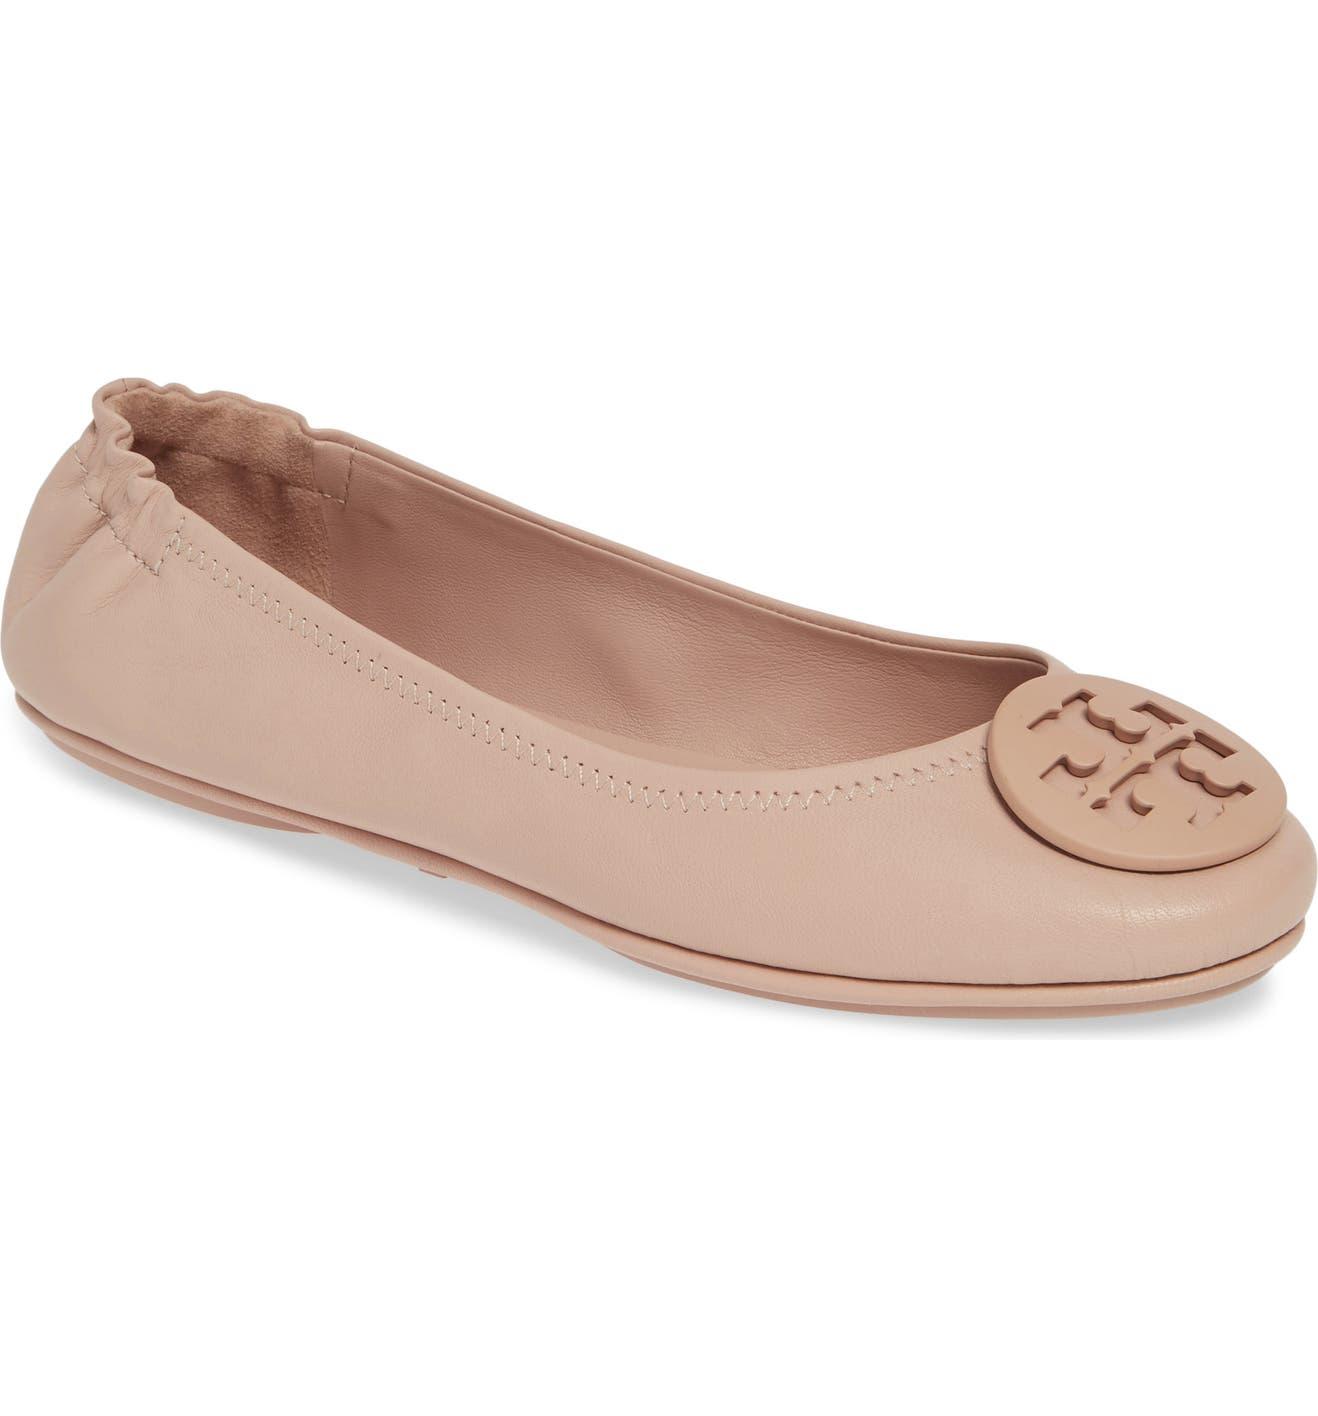 74249ed22 Tory Burch  Minnie  Travel Ballet Flat (Women)